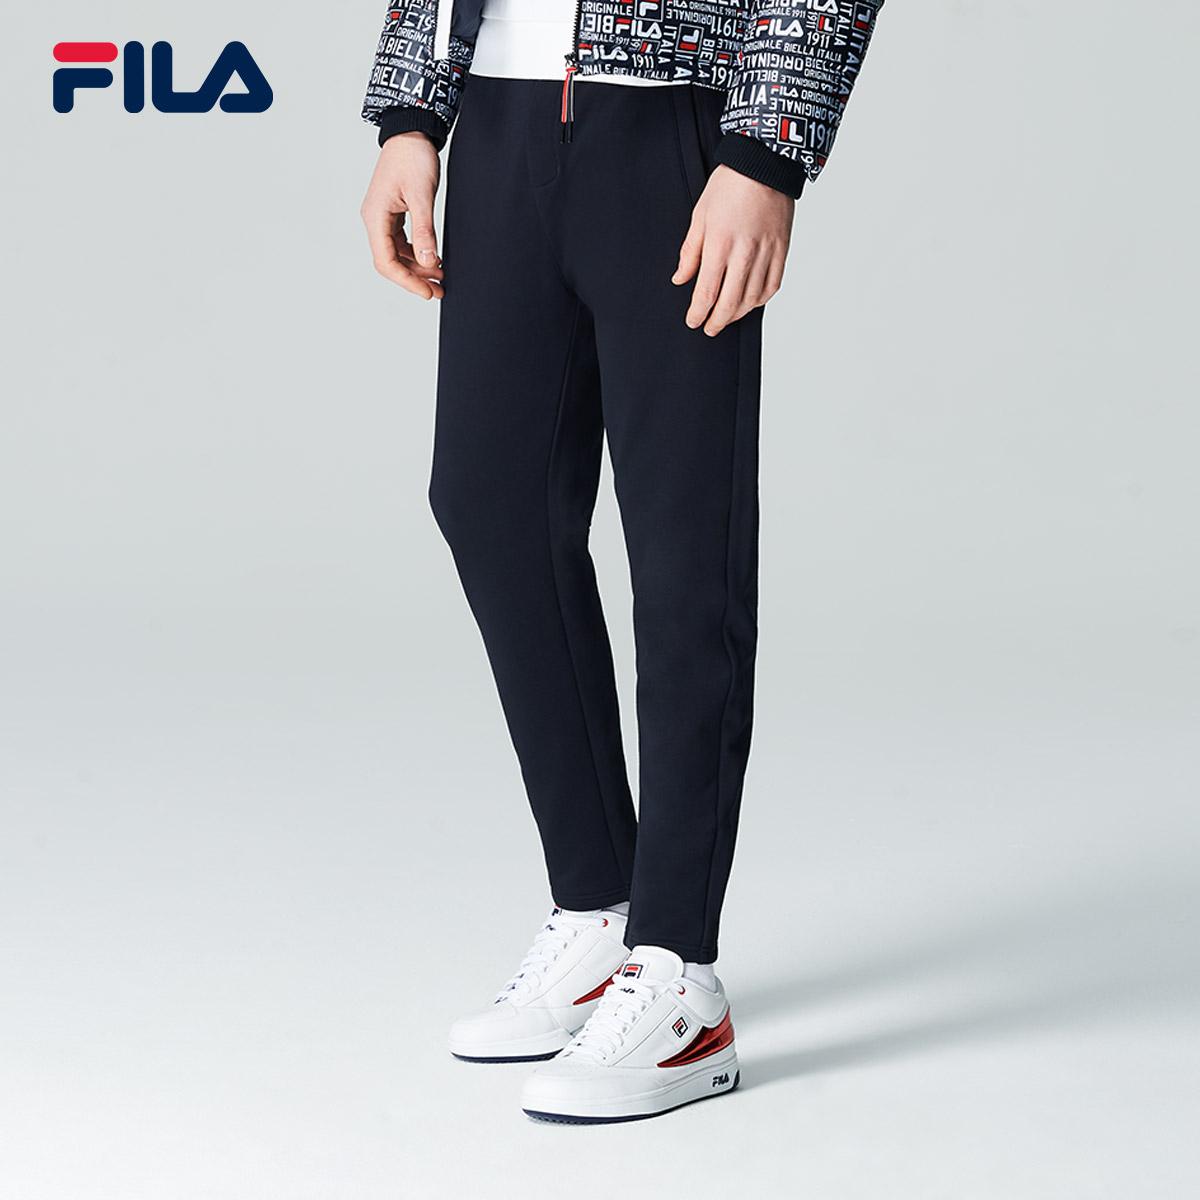 FILA斐乐长裤男2018冬季新款时尚运动休闲简约舒适针织长裤男